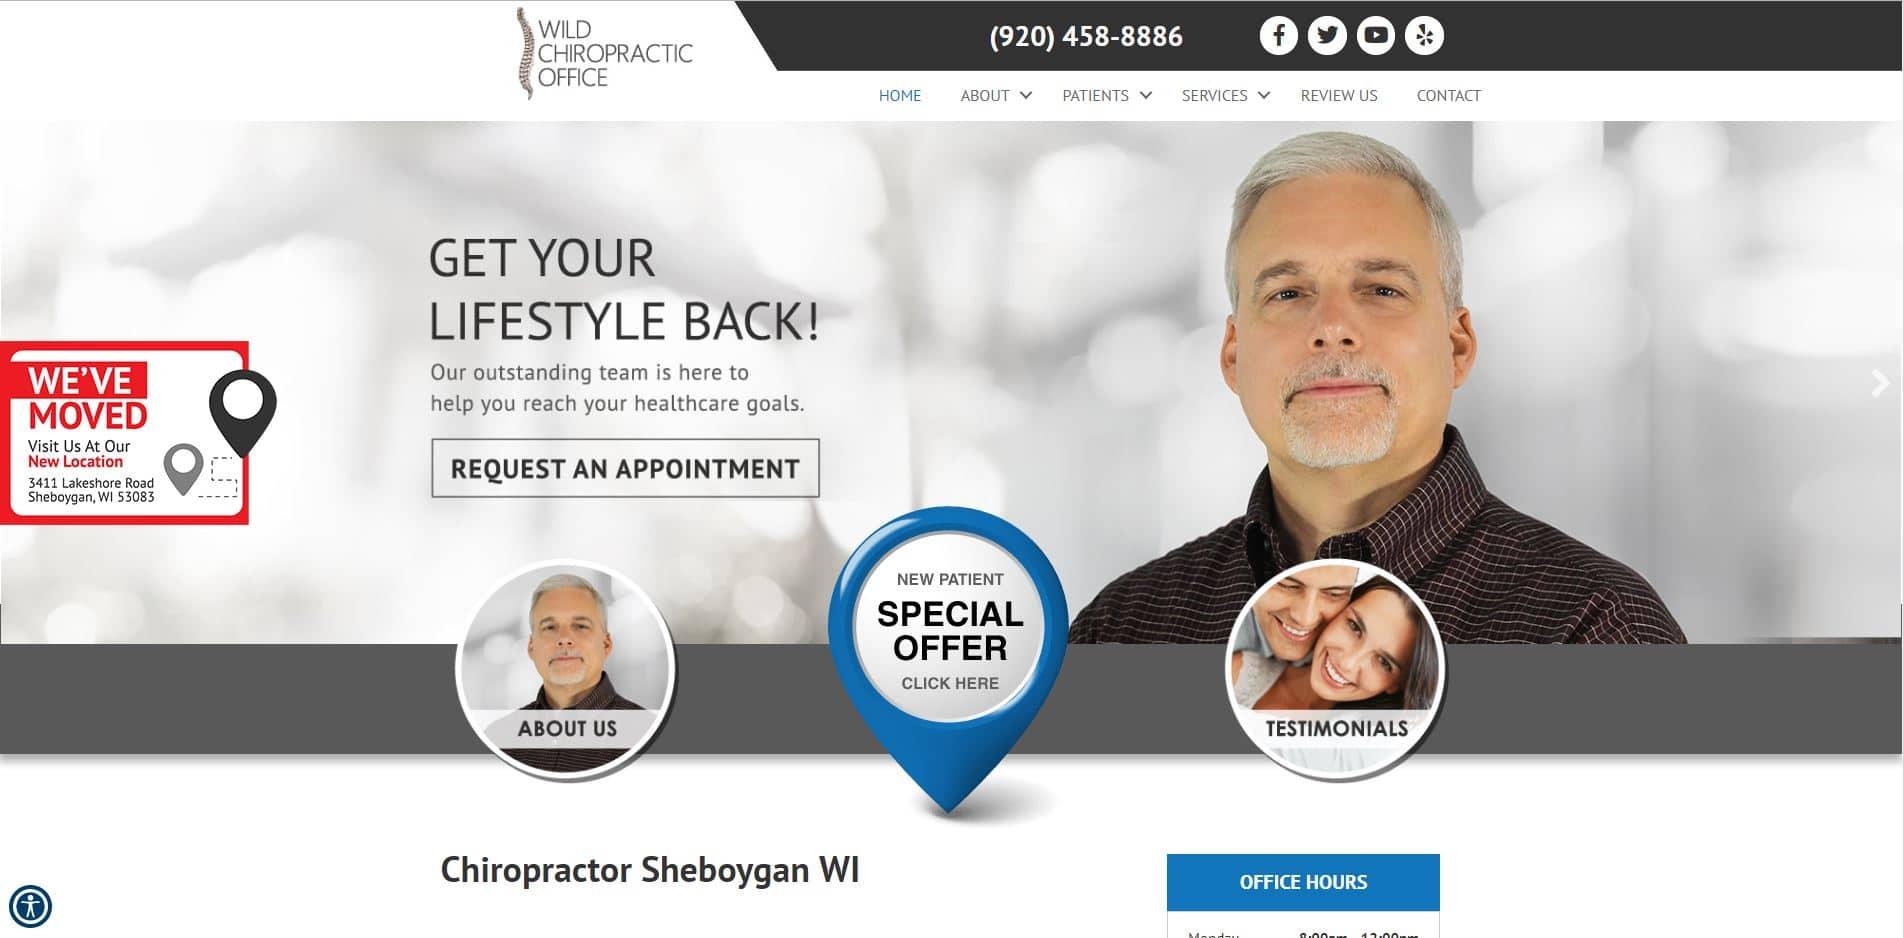 Chiropractor in Sheboygan